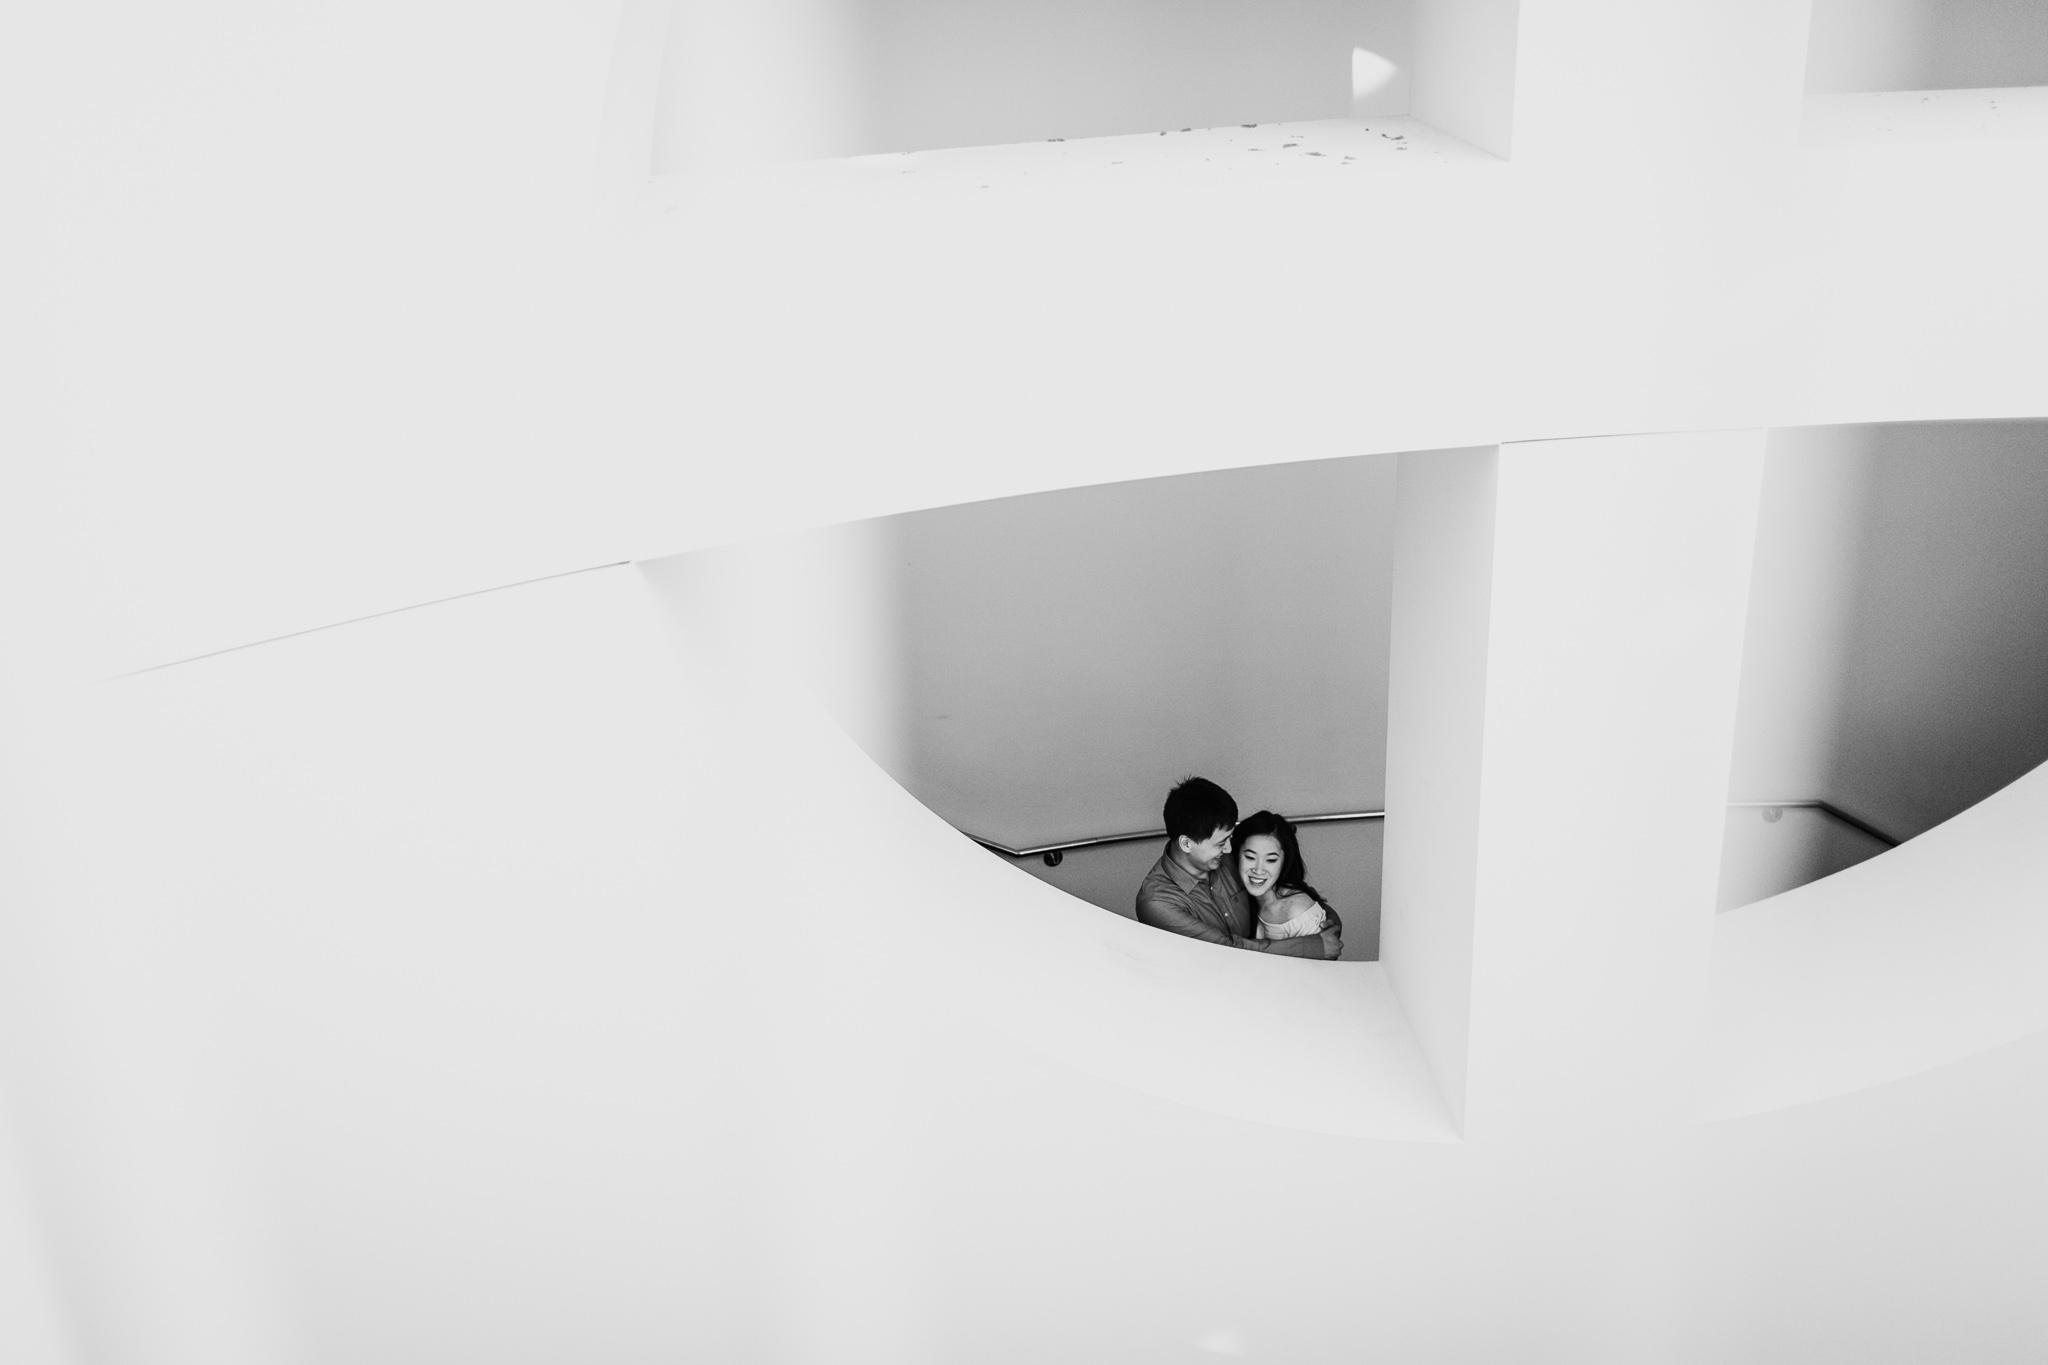 SFMOMA-Engagement-Session-SanFrancisco-Photographer-13.jpg